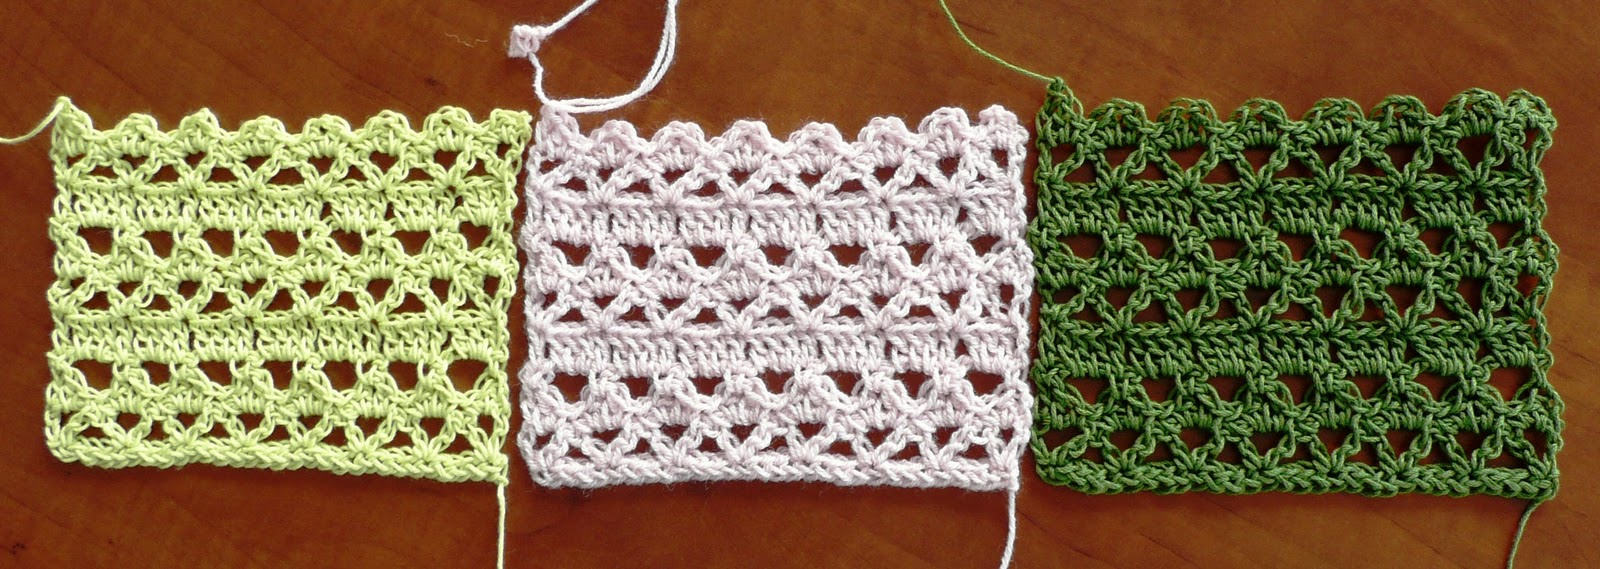 February 2011 Doris Chan Crochet